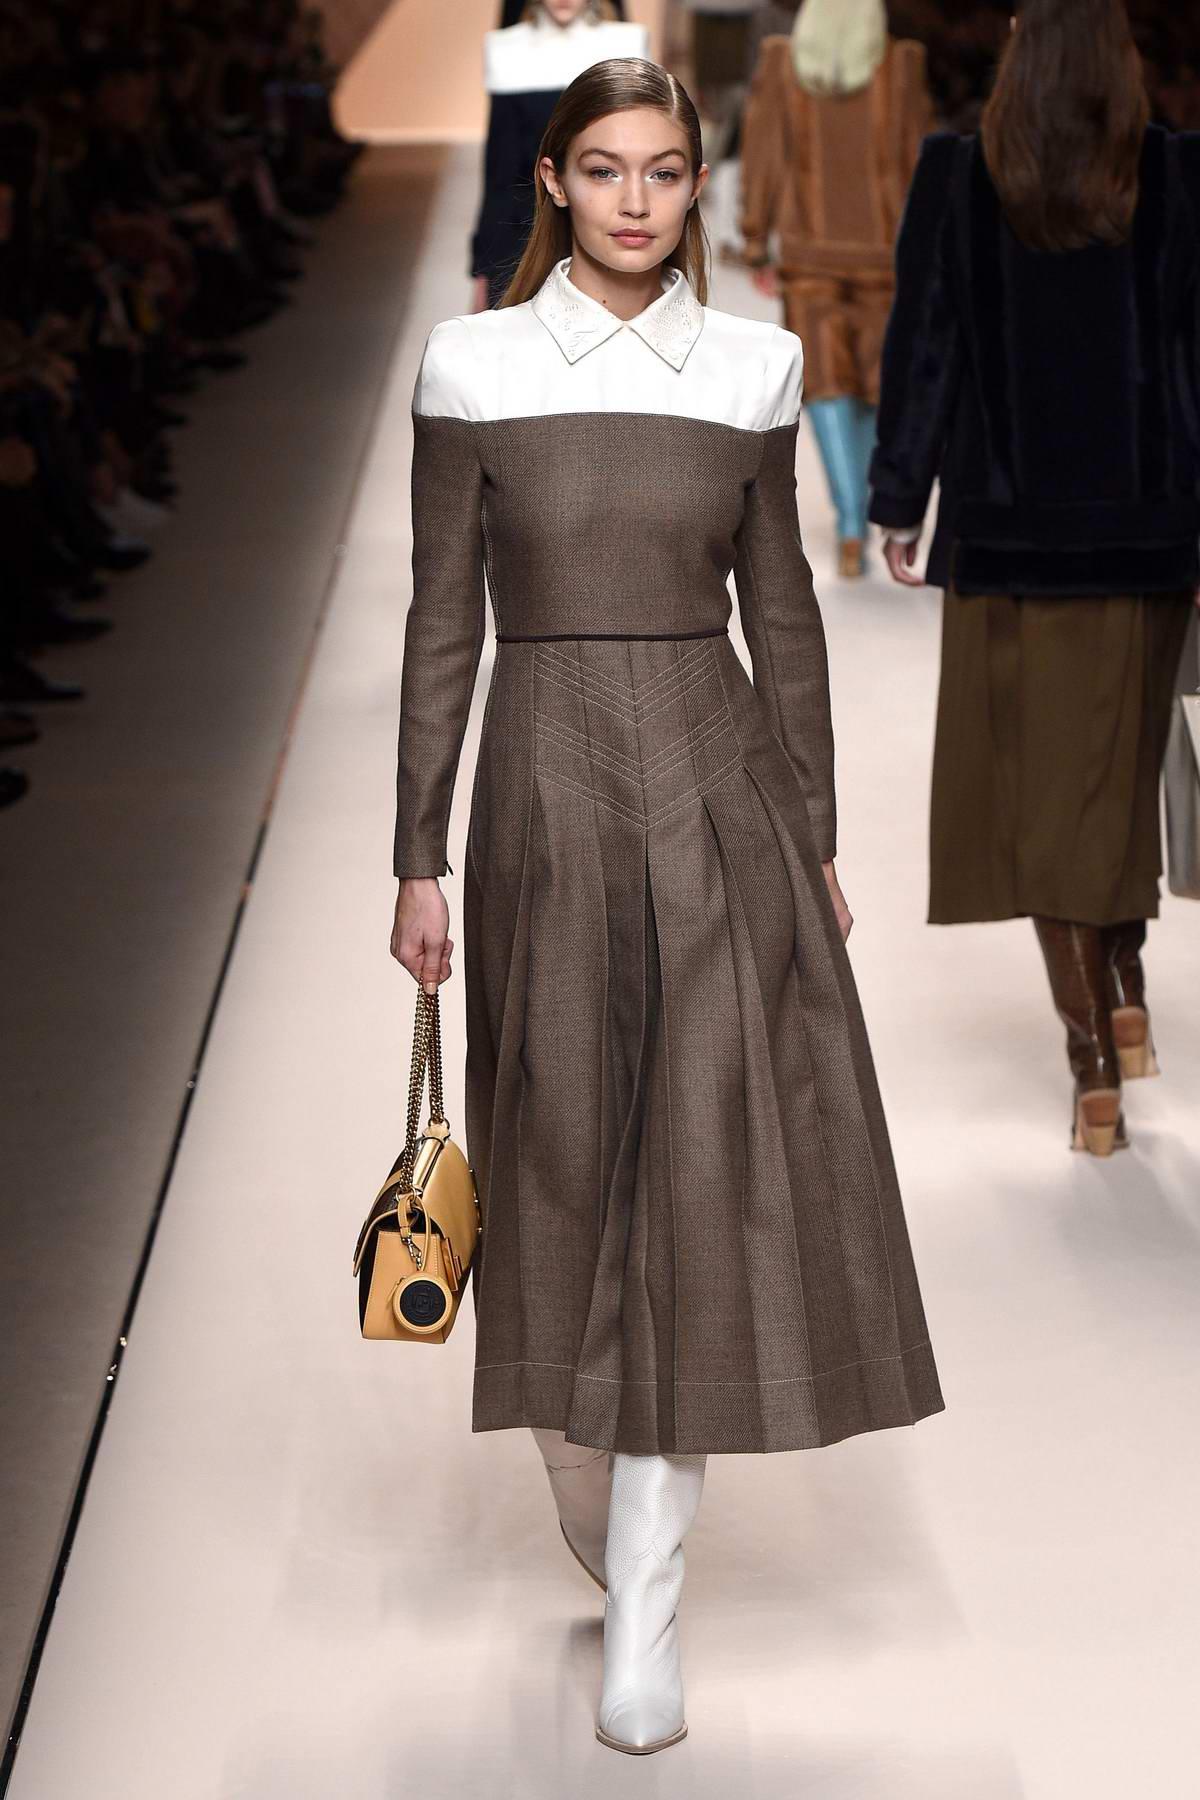 Gigi Hadid walks for Fendi Show, Fall Winter 2018 during Milan Fashion Week in Milan, Italy